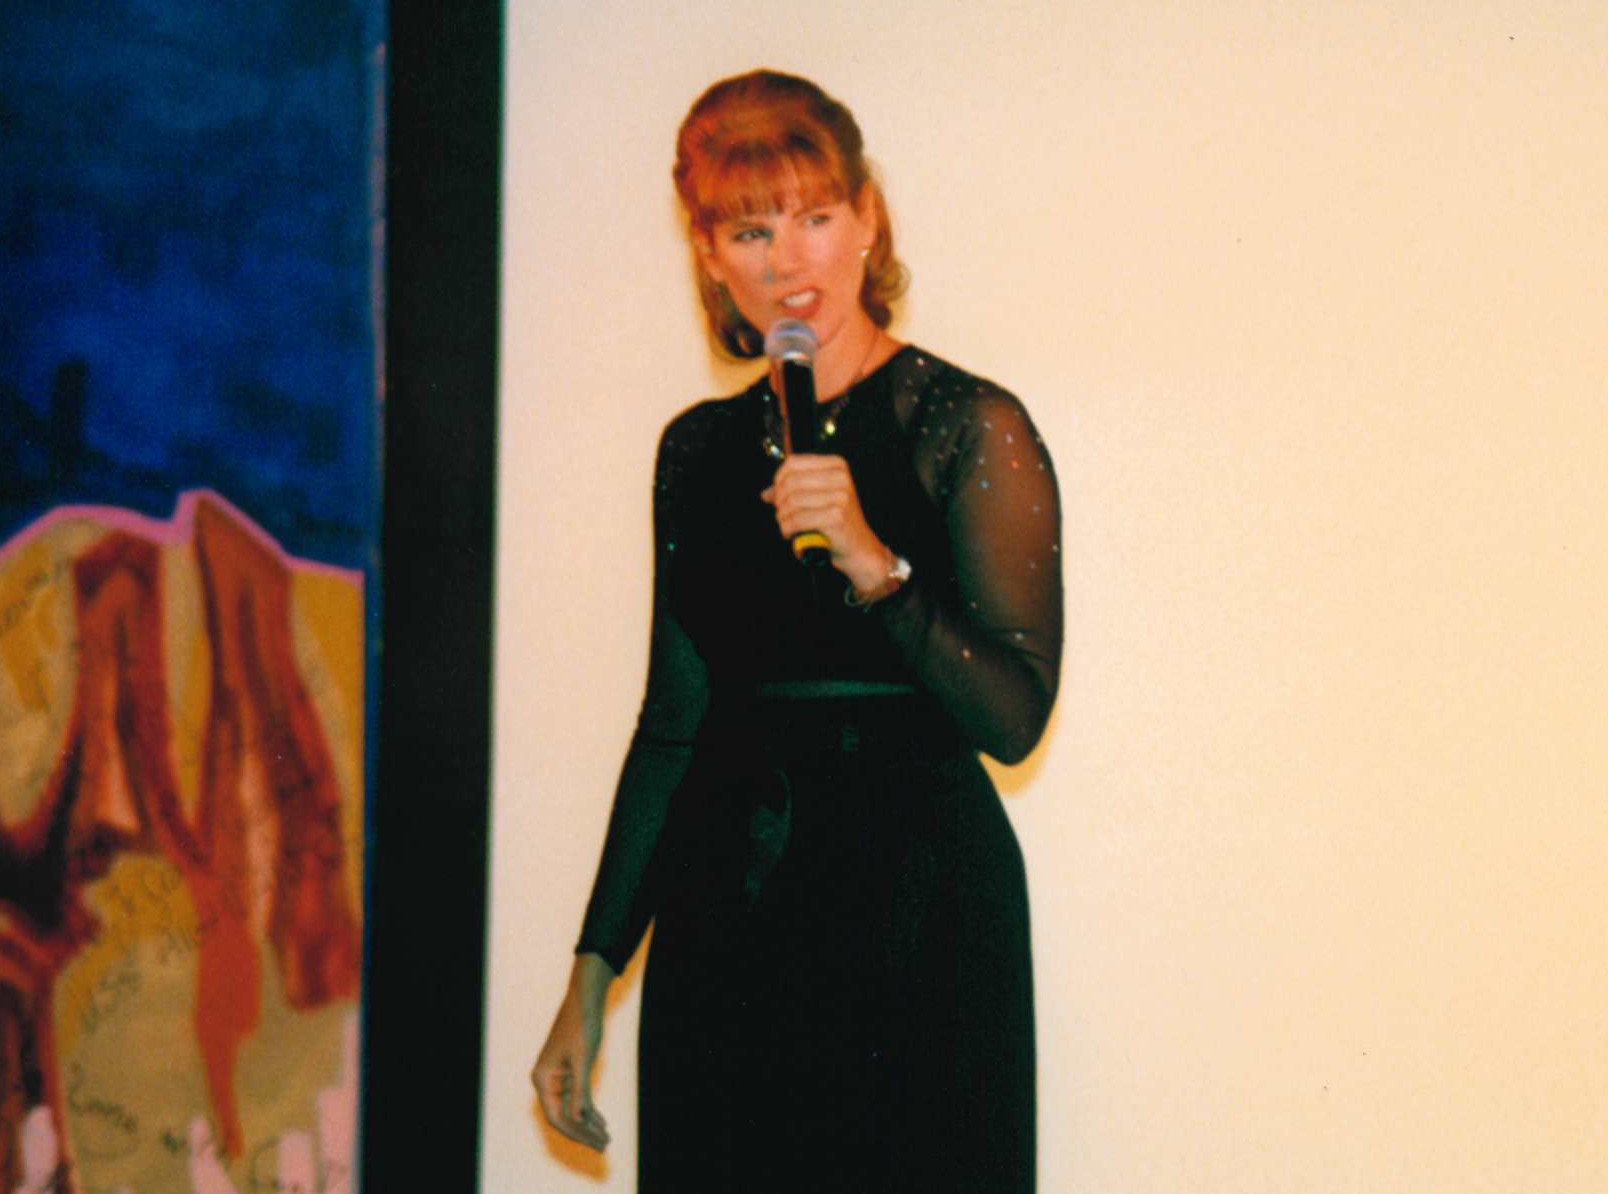 Patricia-Tallman-2